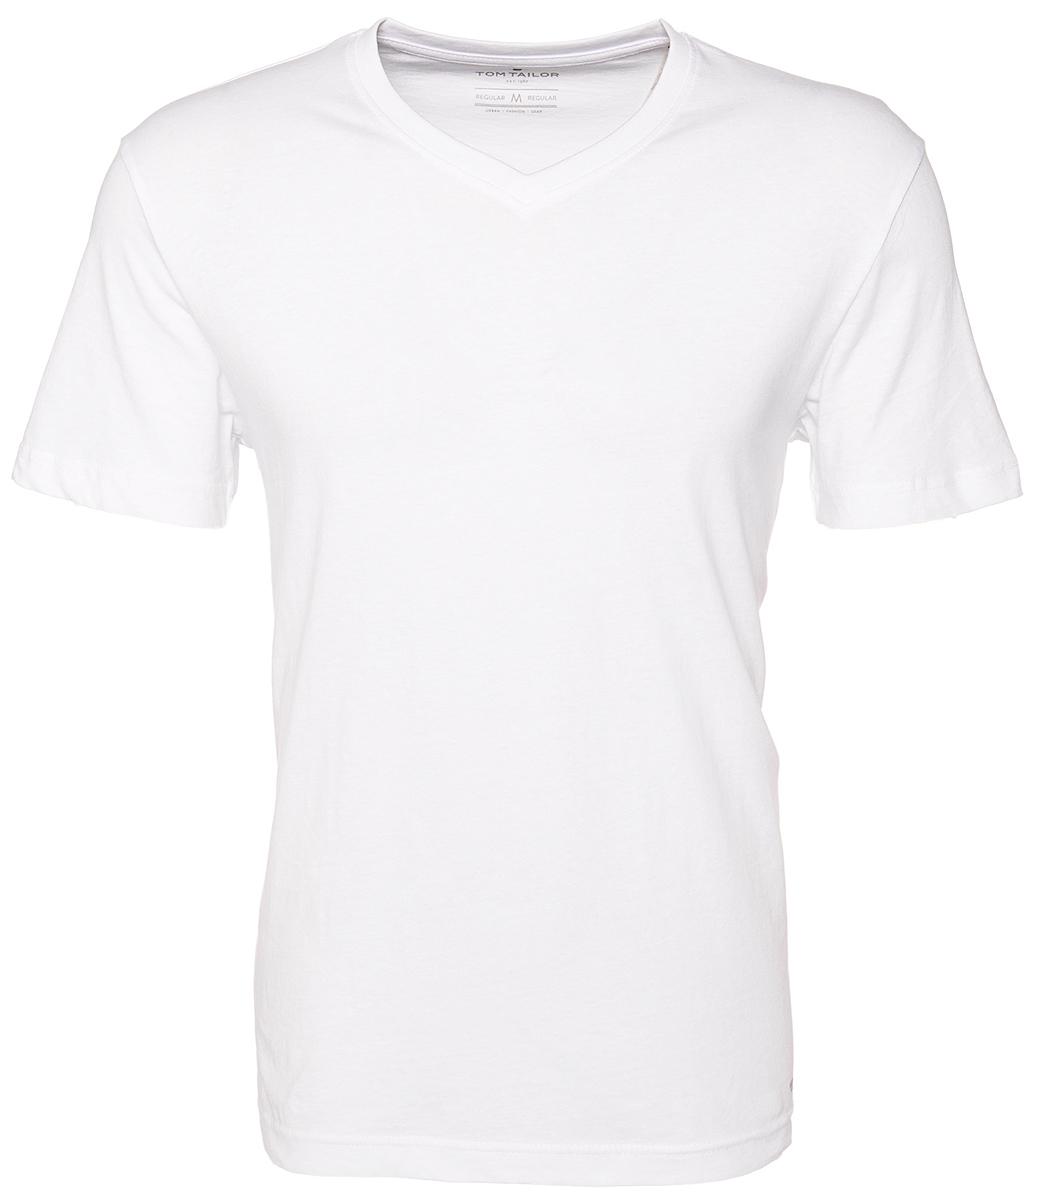 Футболка муж Tom Tailor, цвет: белый. 1028703.09.10_2000. Размер 3XL (56)1028703.09.10_2000